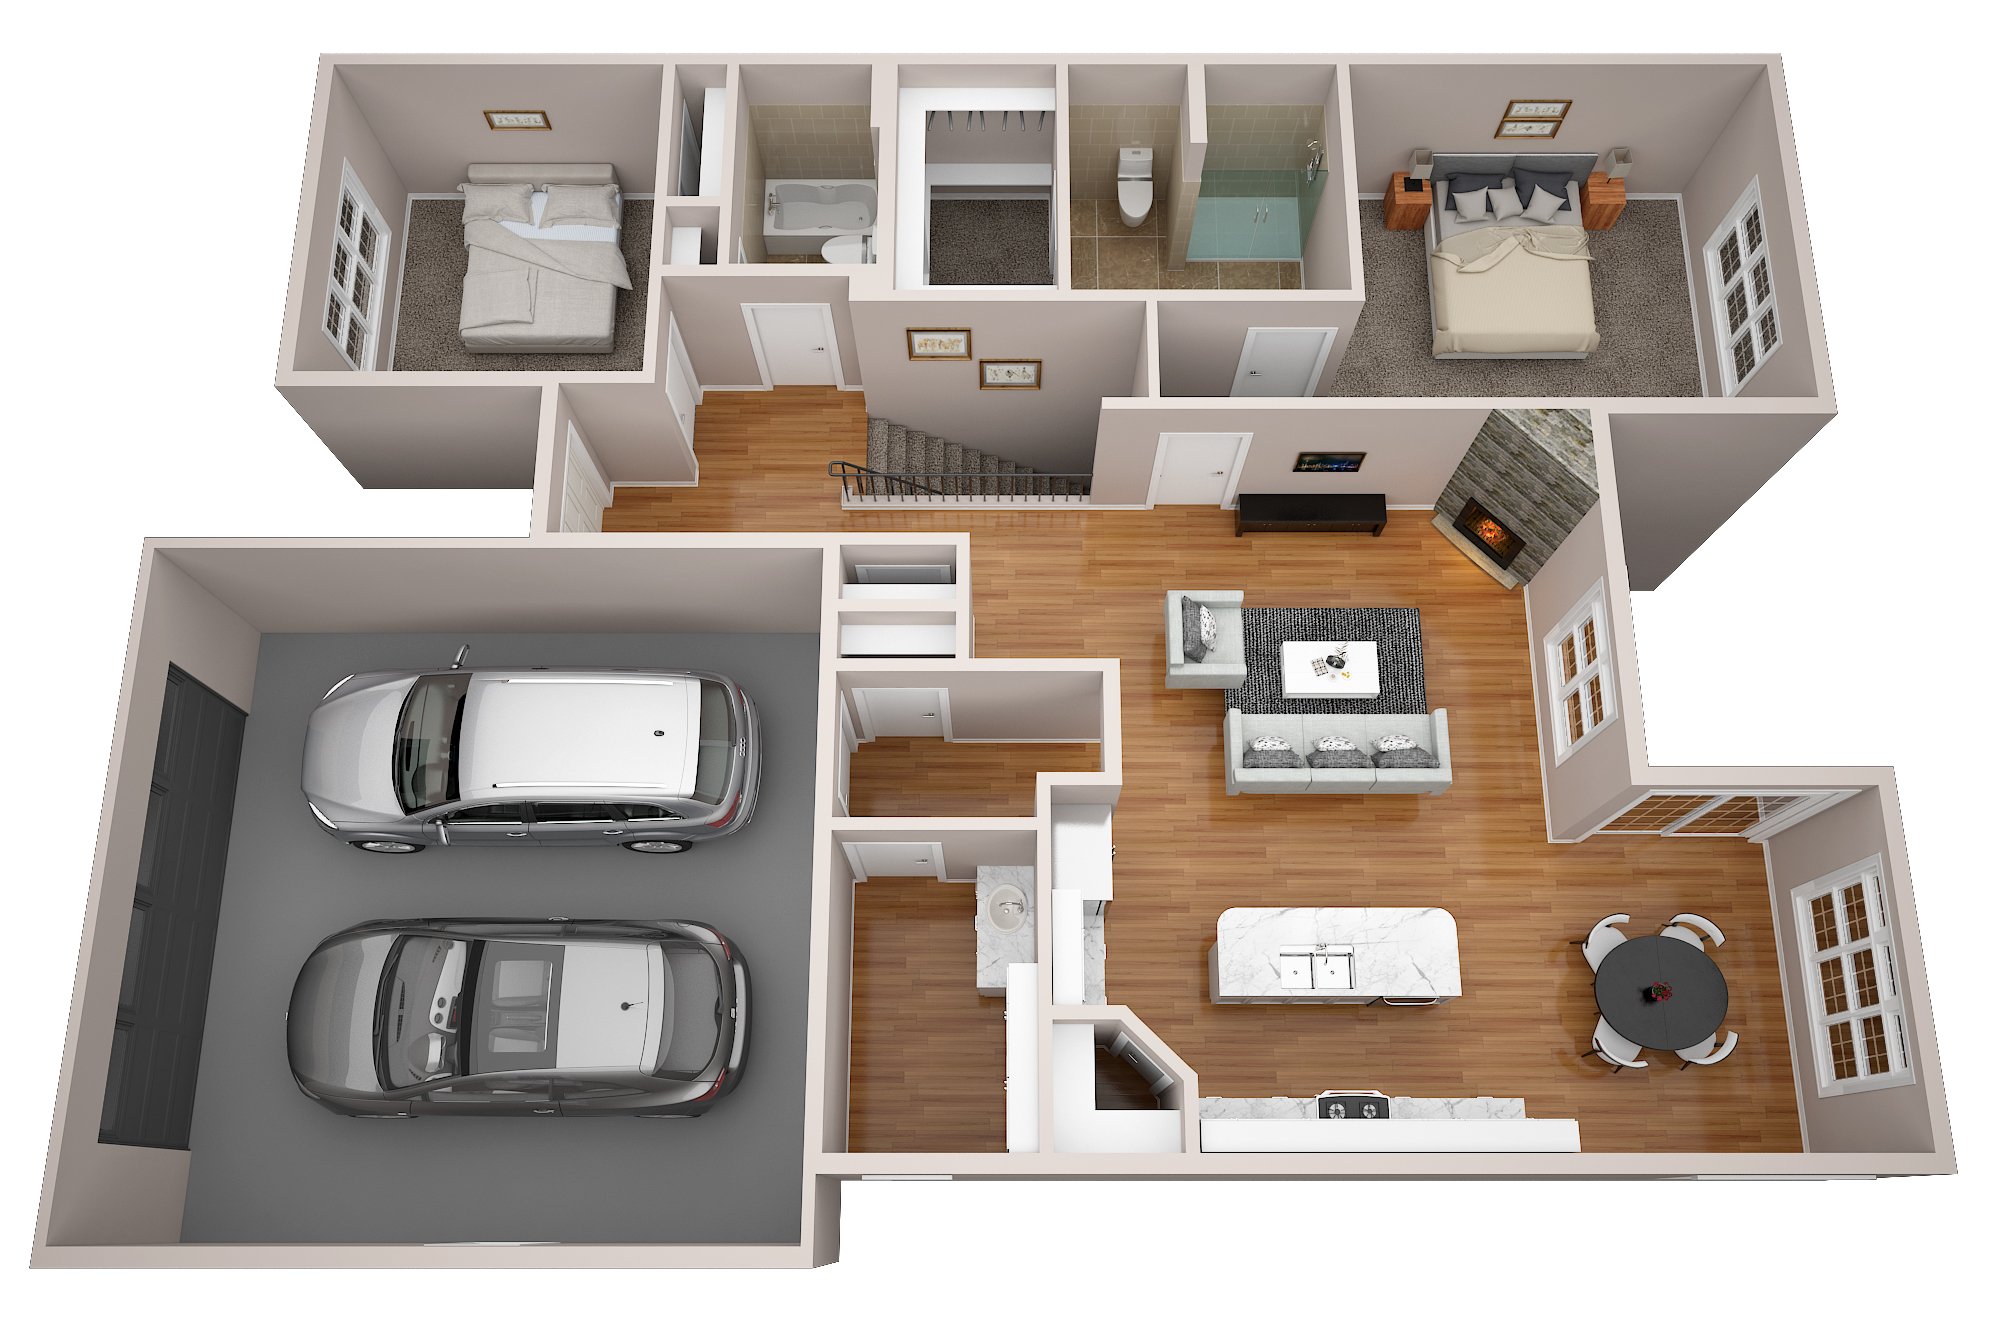 Berg_VR_B_Floor Plan.jpg